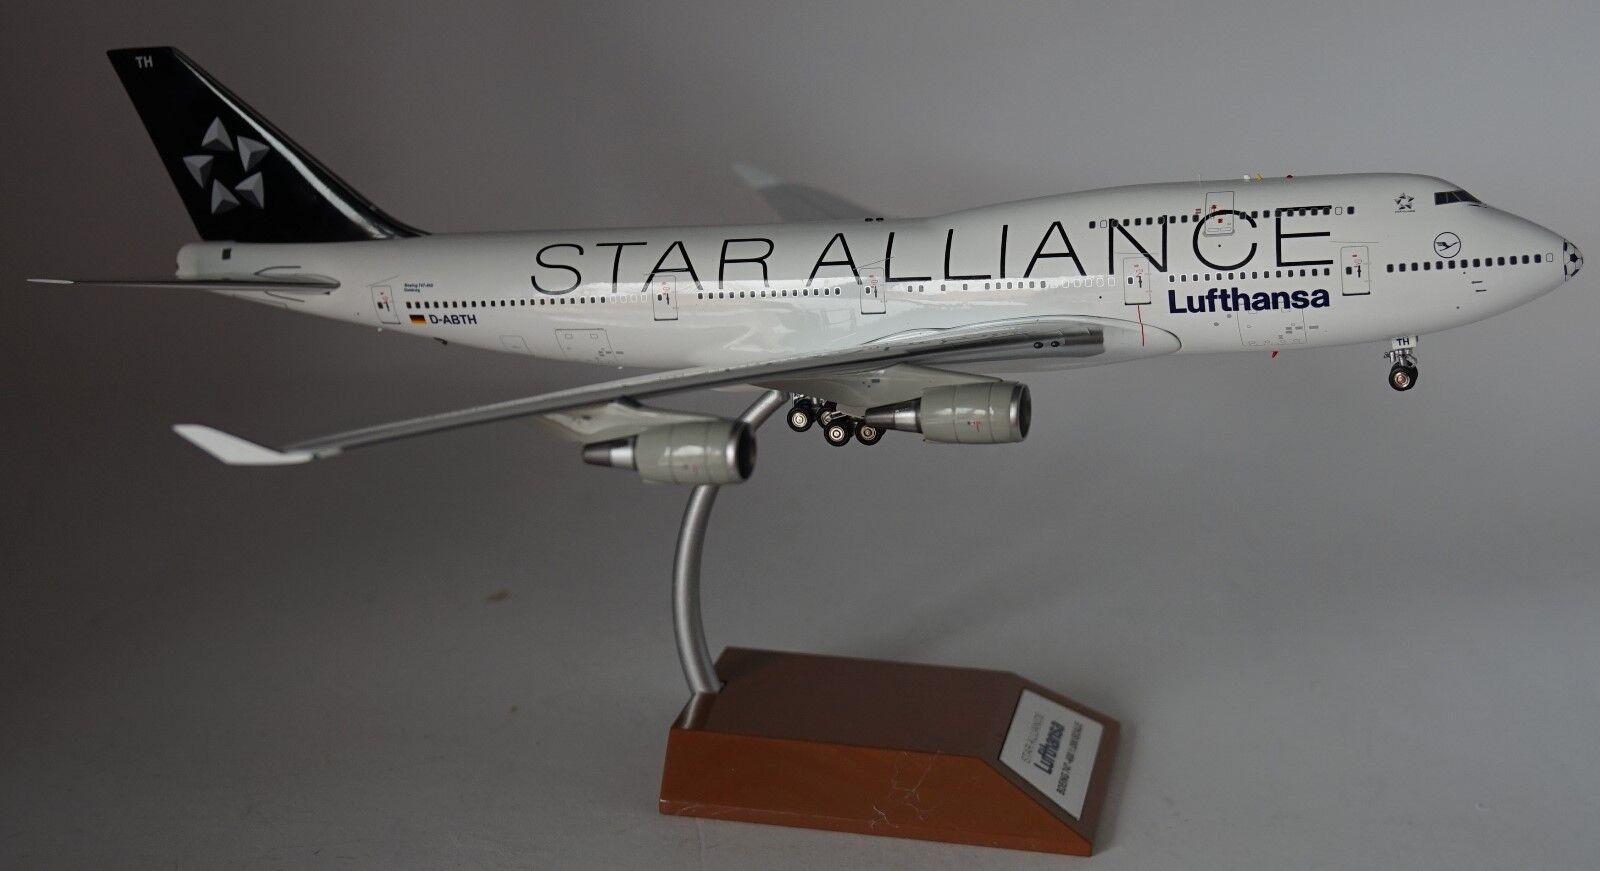 blueE BOX WBSAFOOTBALL Boeing 747-430(M) Lufthansa -Star Alliance D-ABTH in 1 200